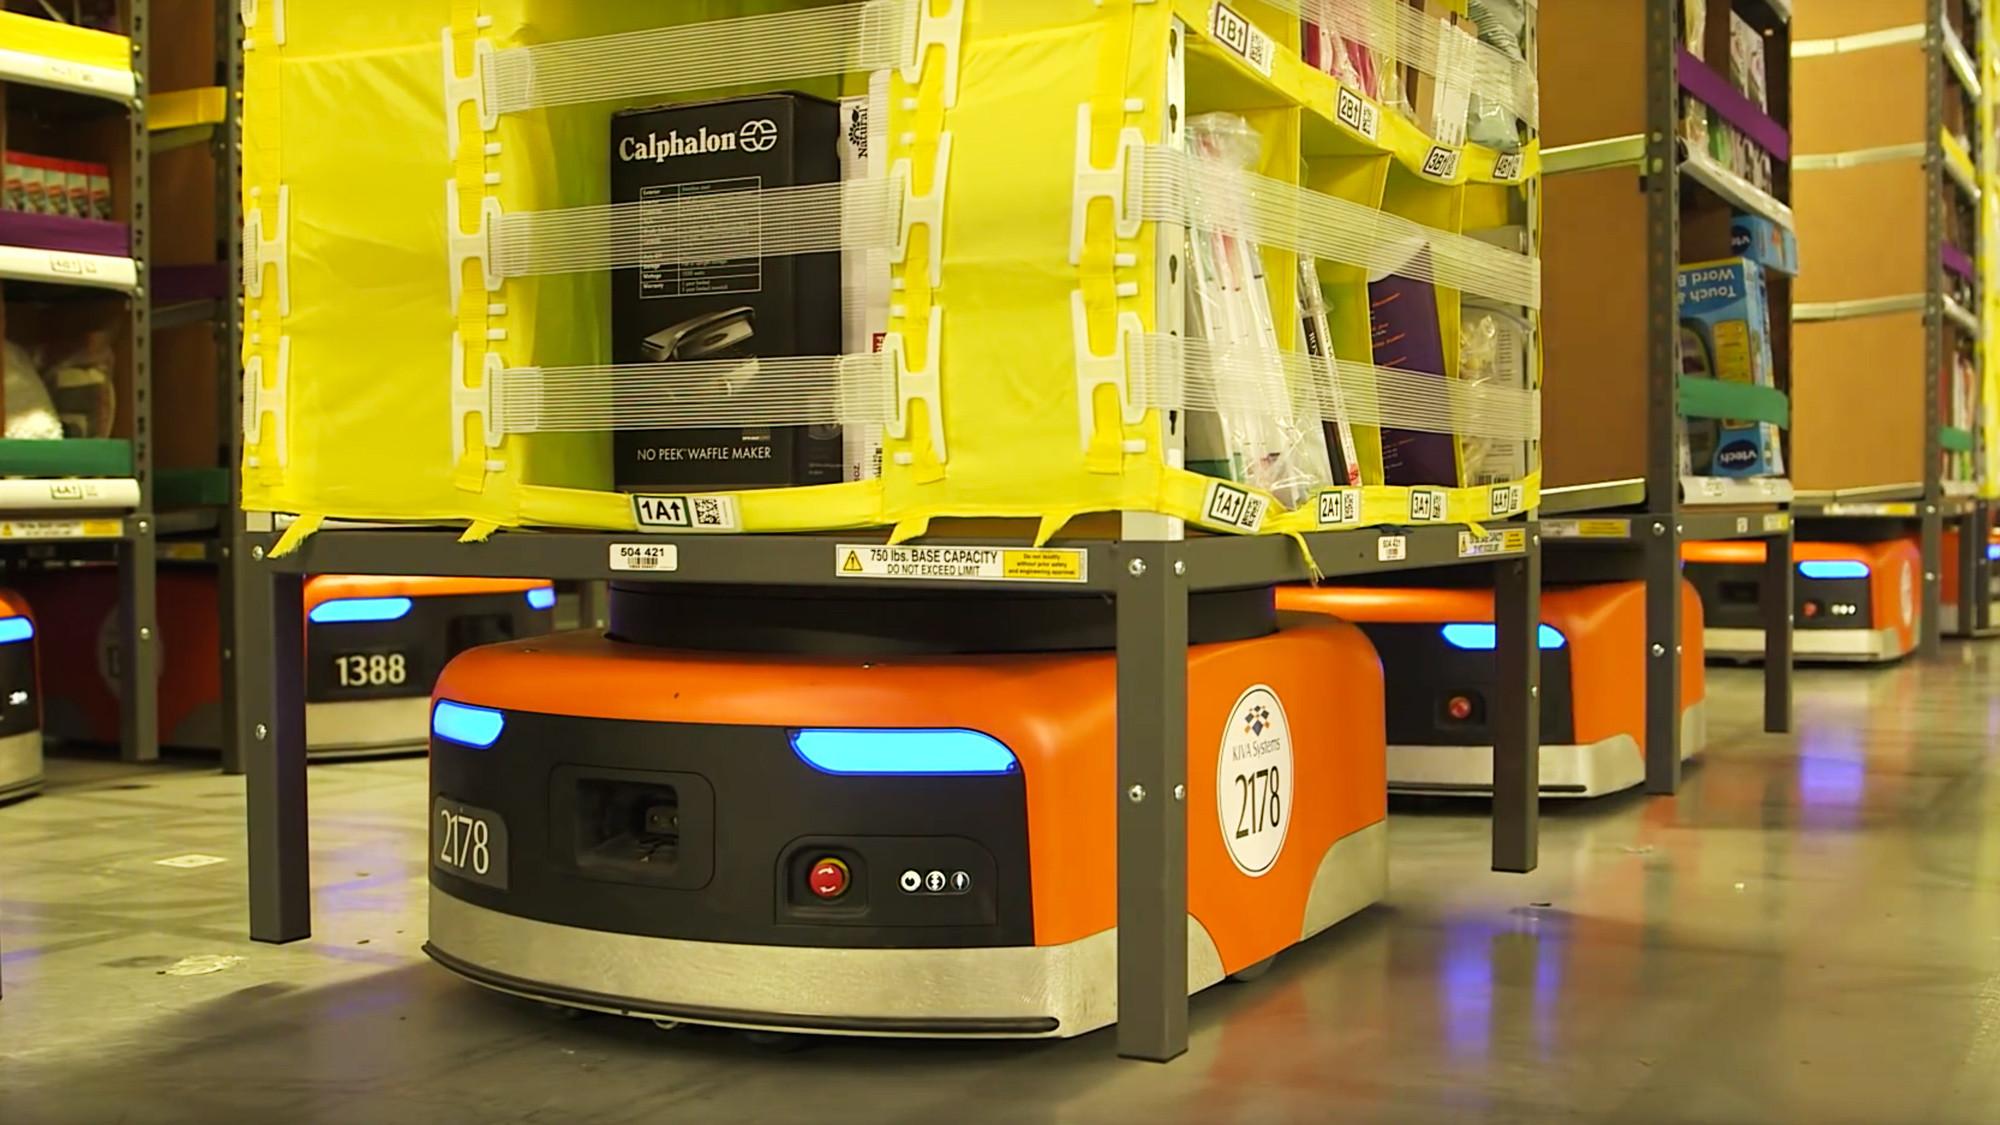 "<p>Фото: &copy; скриншот видео&nbsp;<a href=""https://www.youtube.com/watch?v=quWFjS3Ci7A"" target=""_blank"">youtube.com/Amazon warehouse robots</a>&nbsp;/ L!FE</p>"